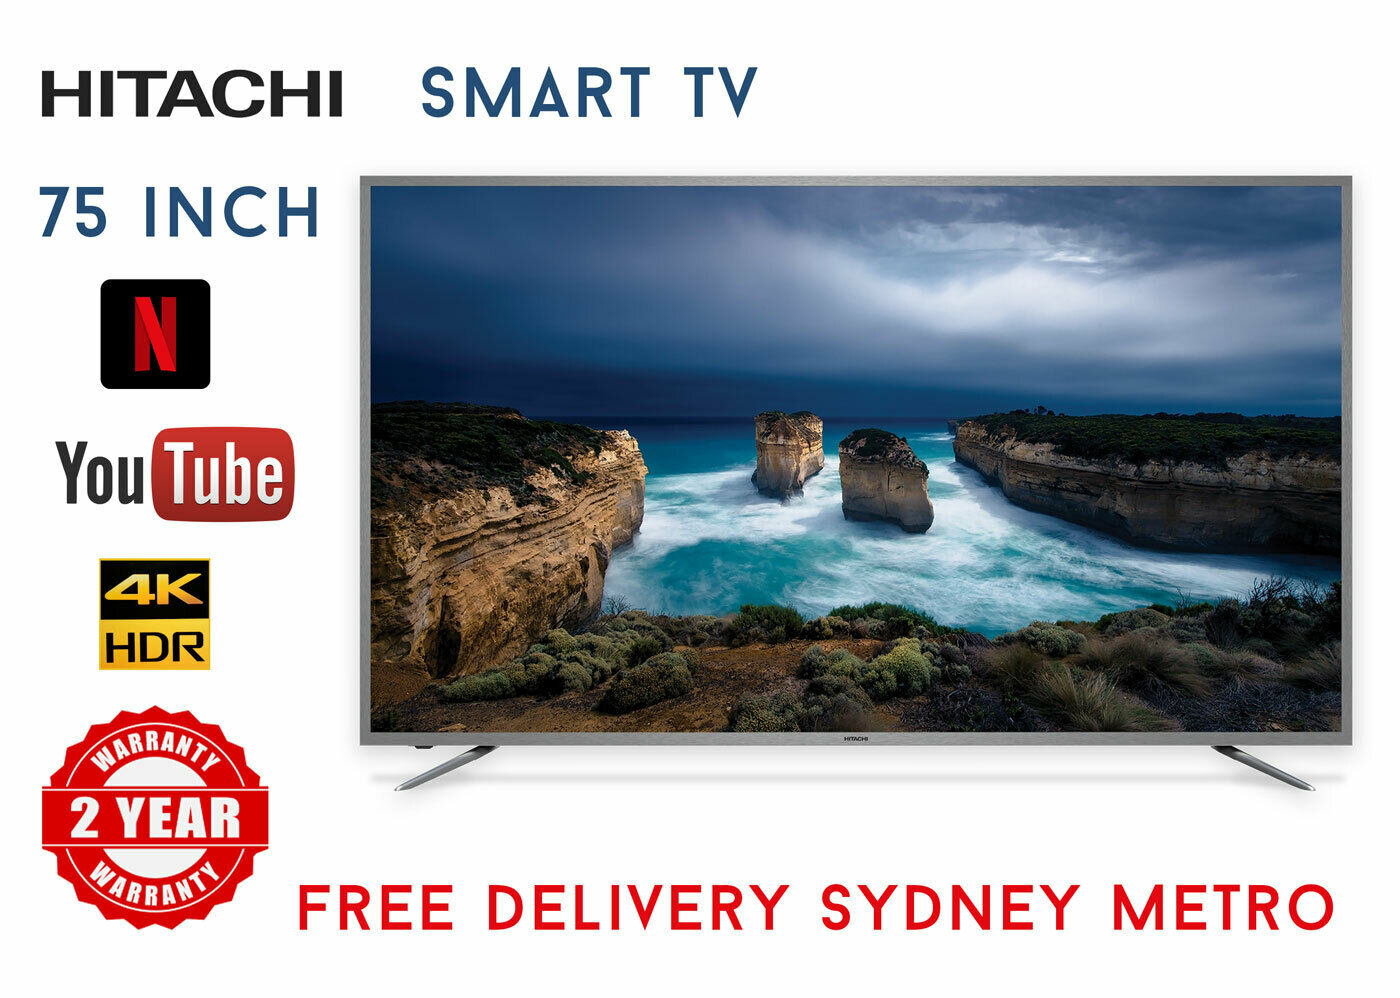 afc3580f313 Details about BRAND NEW HITACHI 75 INCH 4K UHD LED SMART TV NETFLIX SLIM  LINE HDR AIR MOUSE